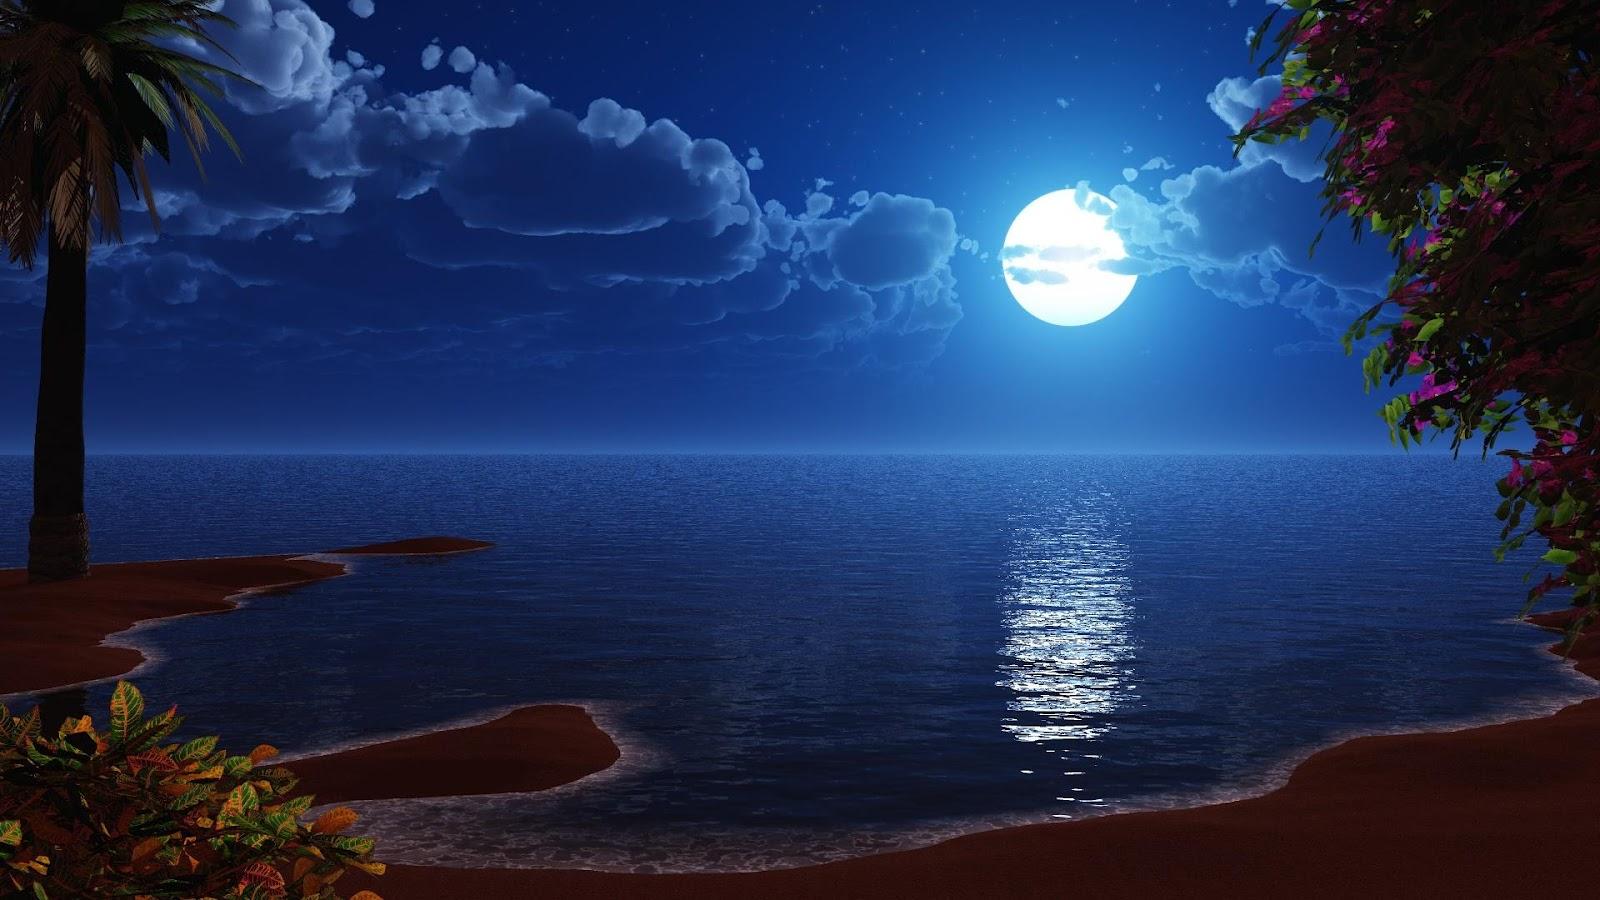 Essay on one night the moon